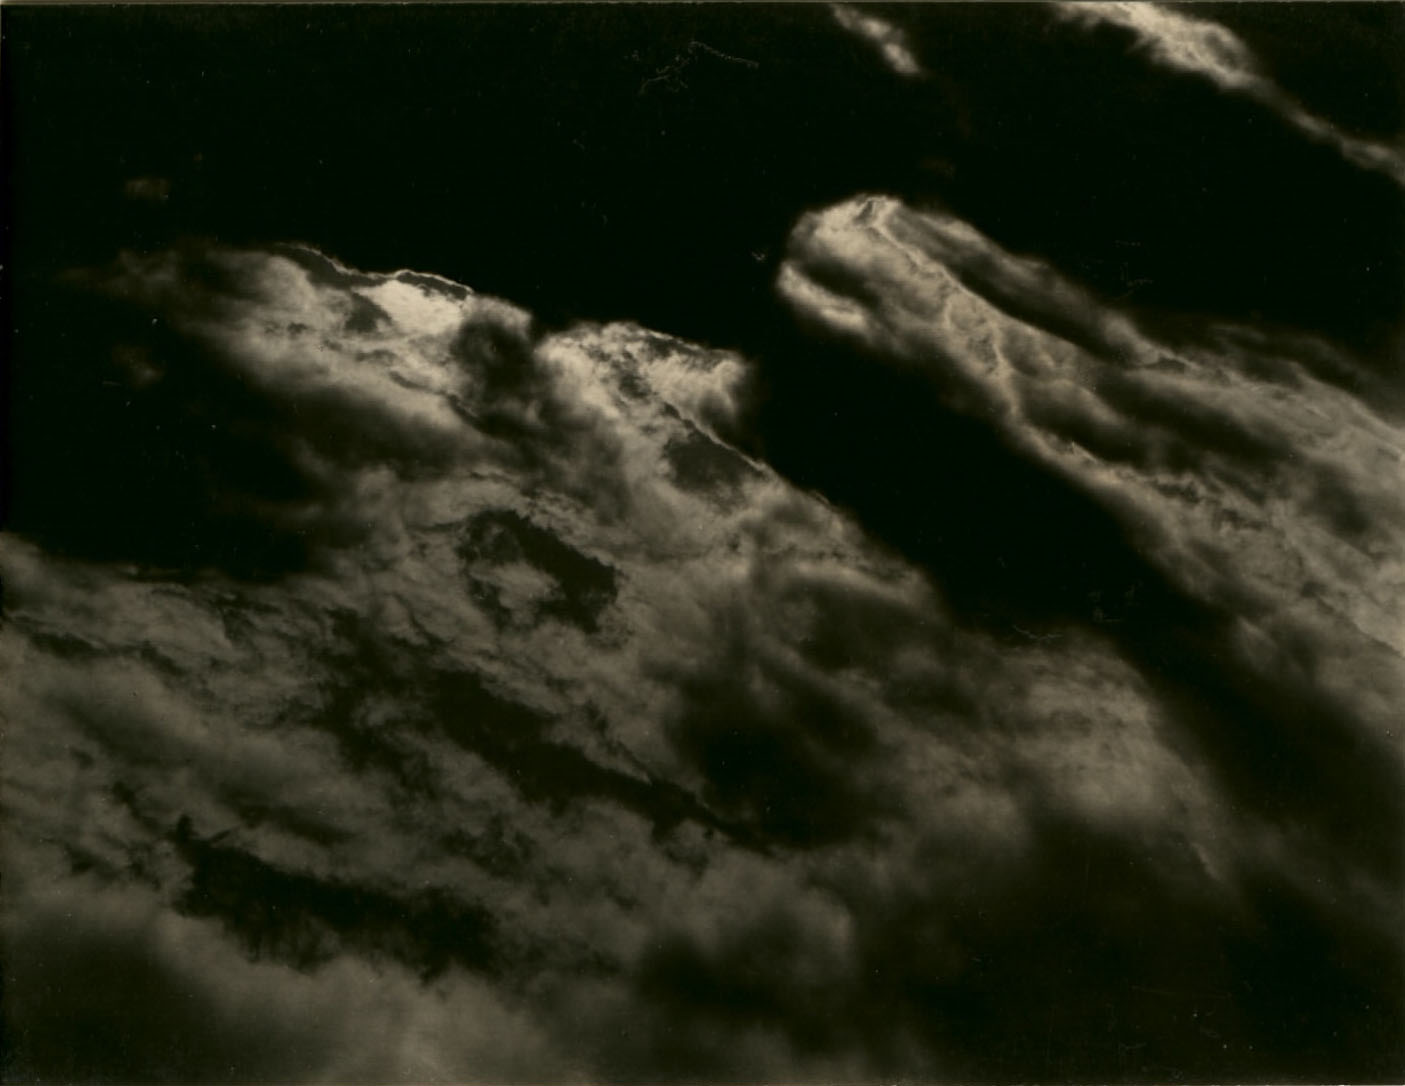 Alfred Stieglitz, Série Equivalents, 1925.